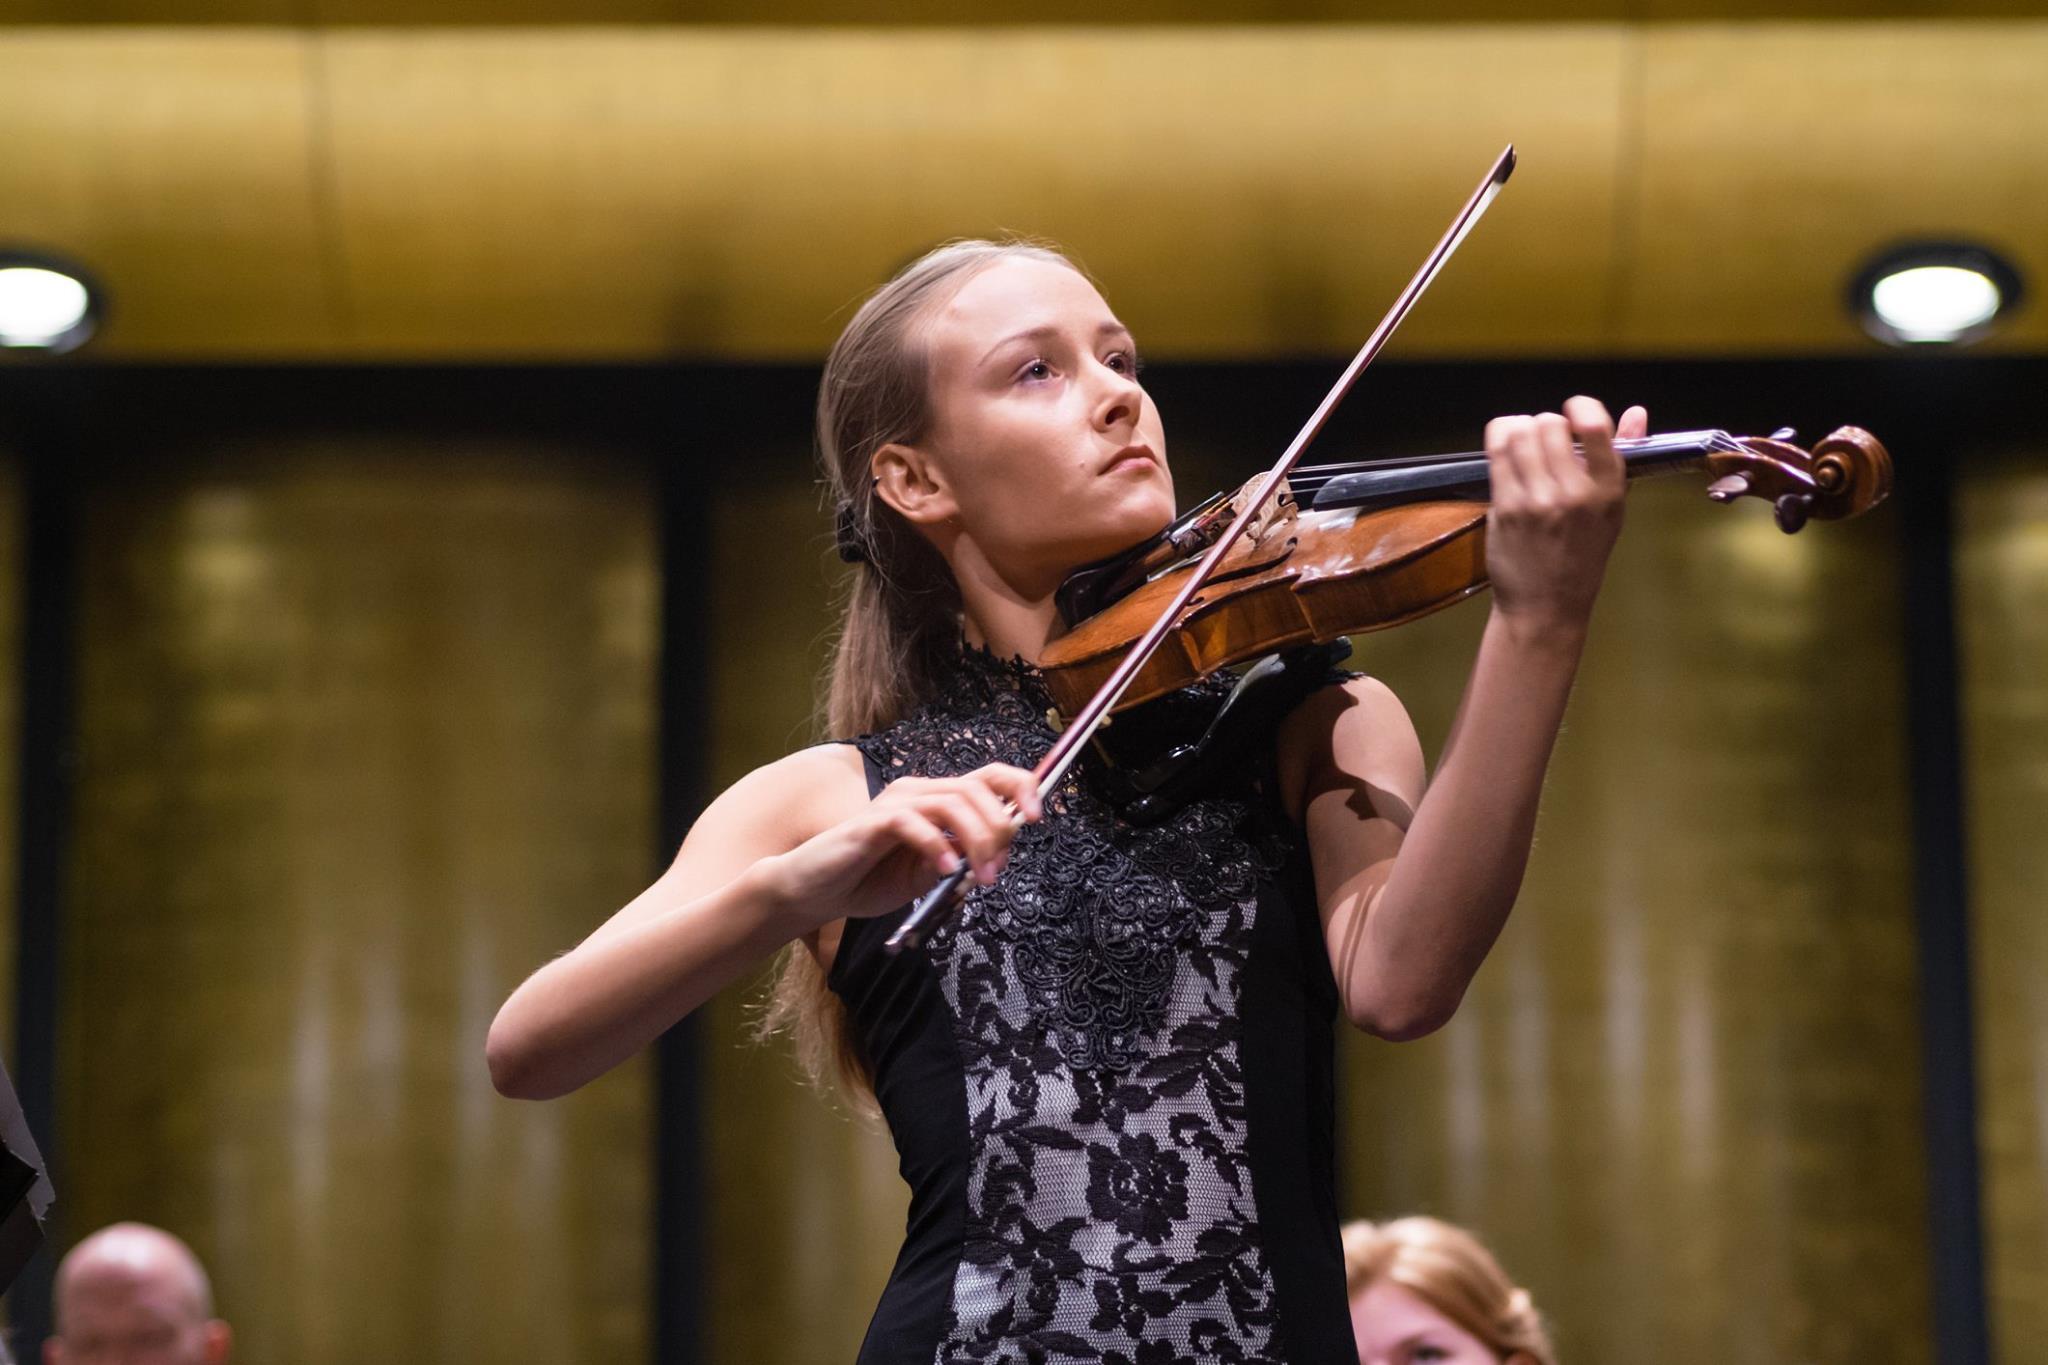 Anna Egholm performance